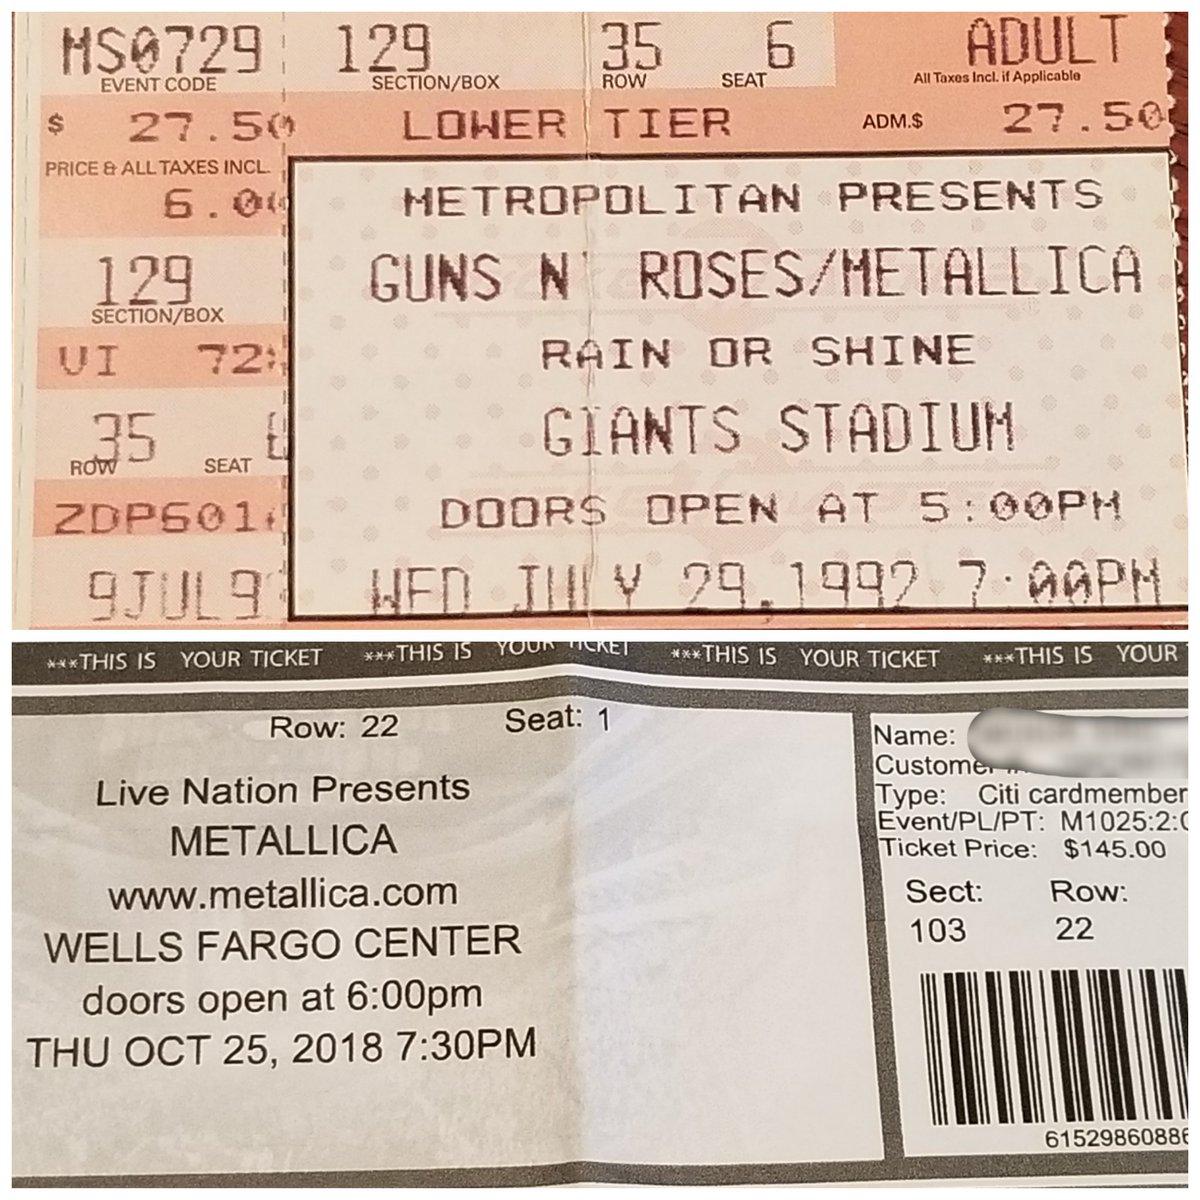 Metallica at Wells Fargo Center in Philadelphia